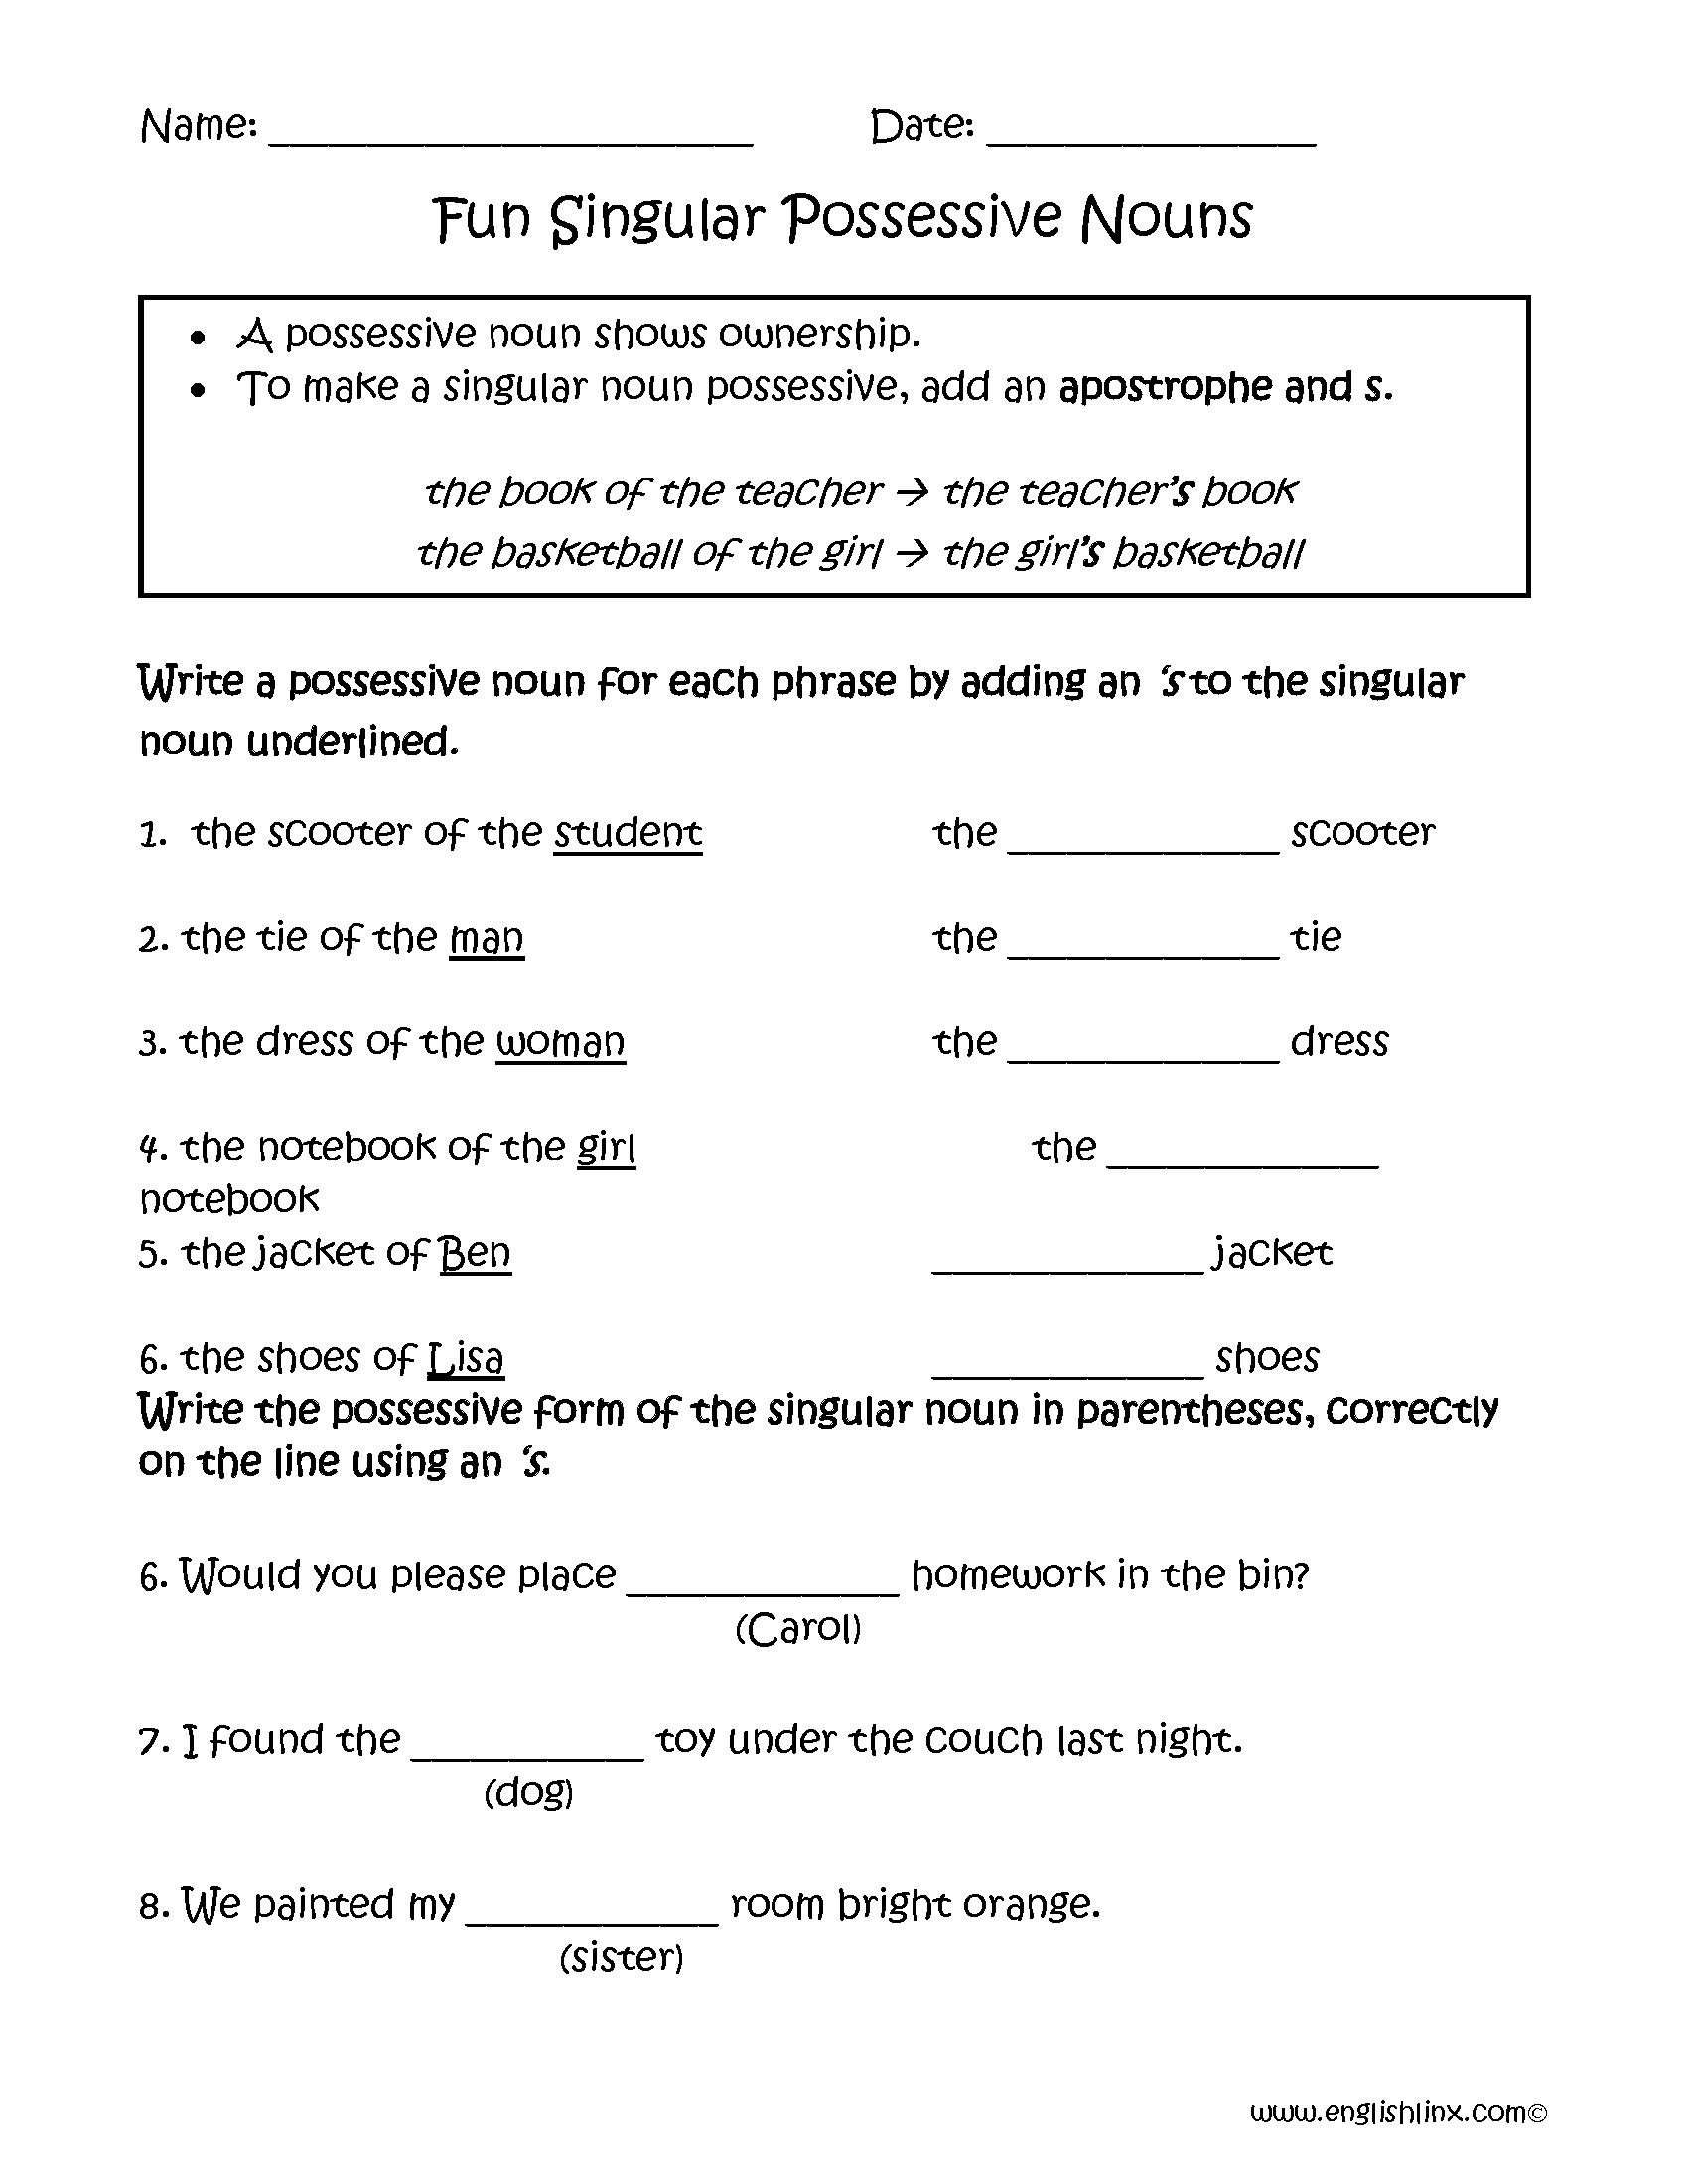 hight resolution of Possessive Nouns Worksheets   Fun Singular Possessive Nouns Worksheets